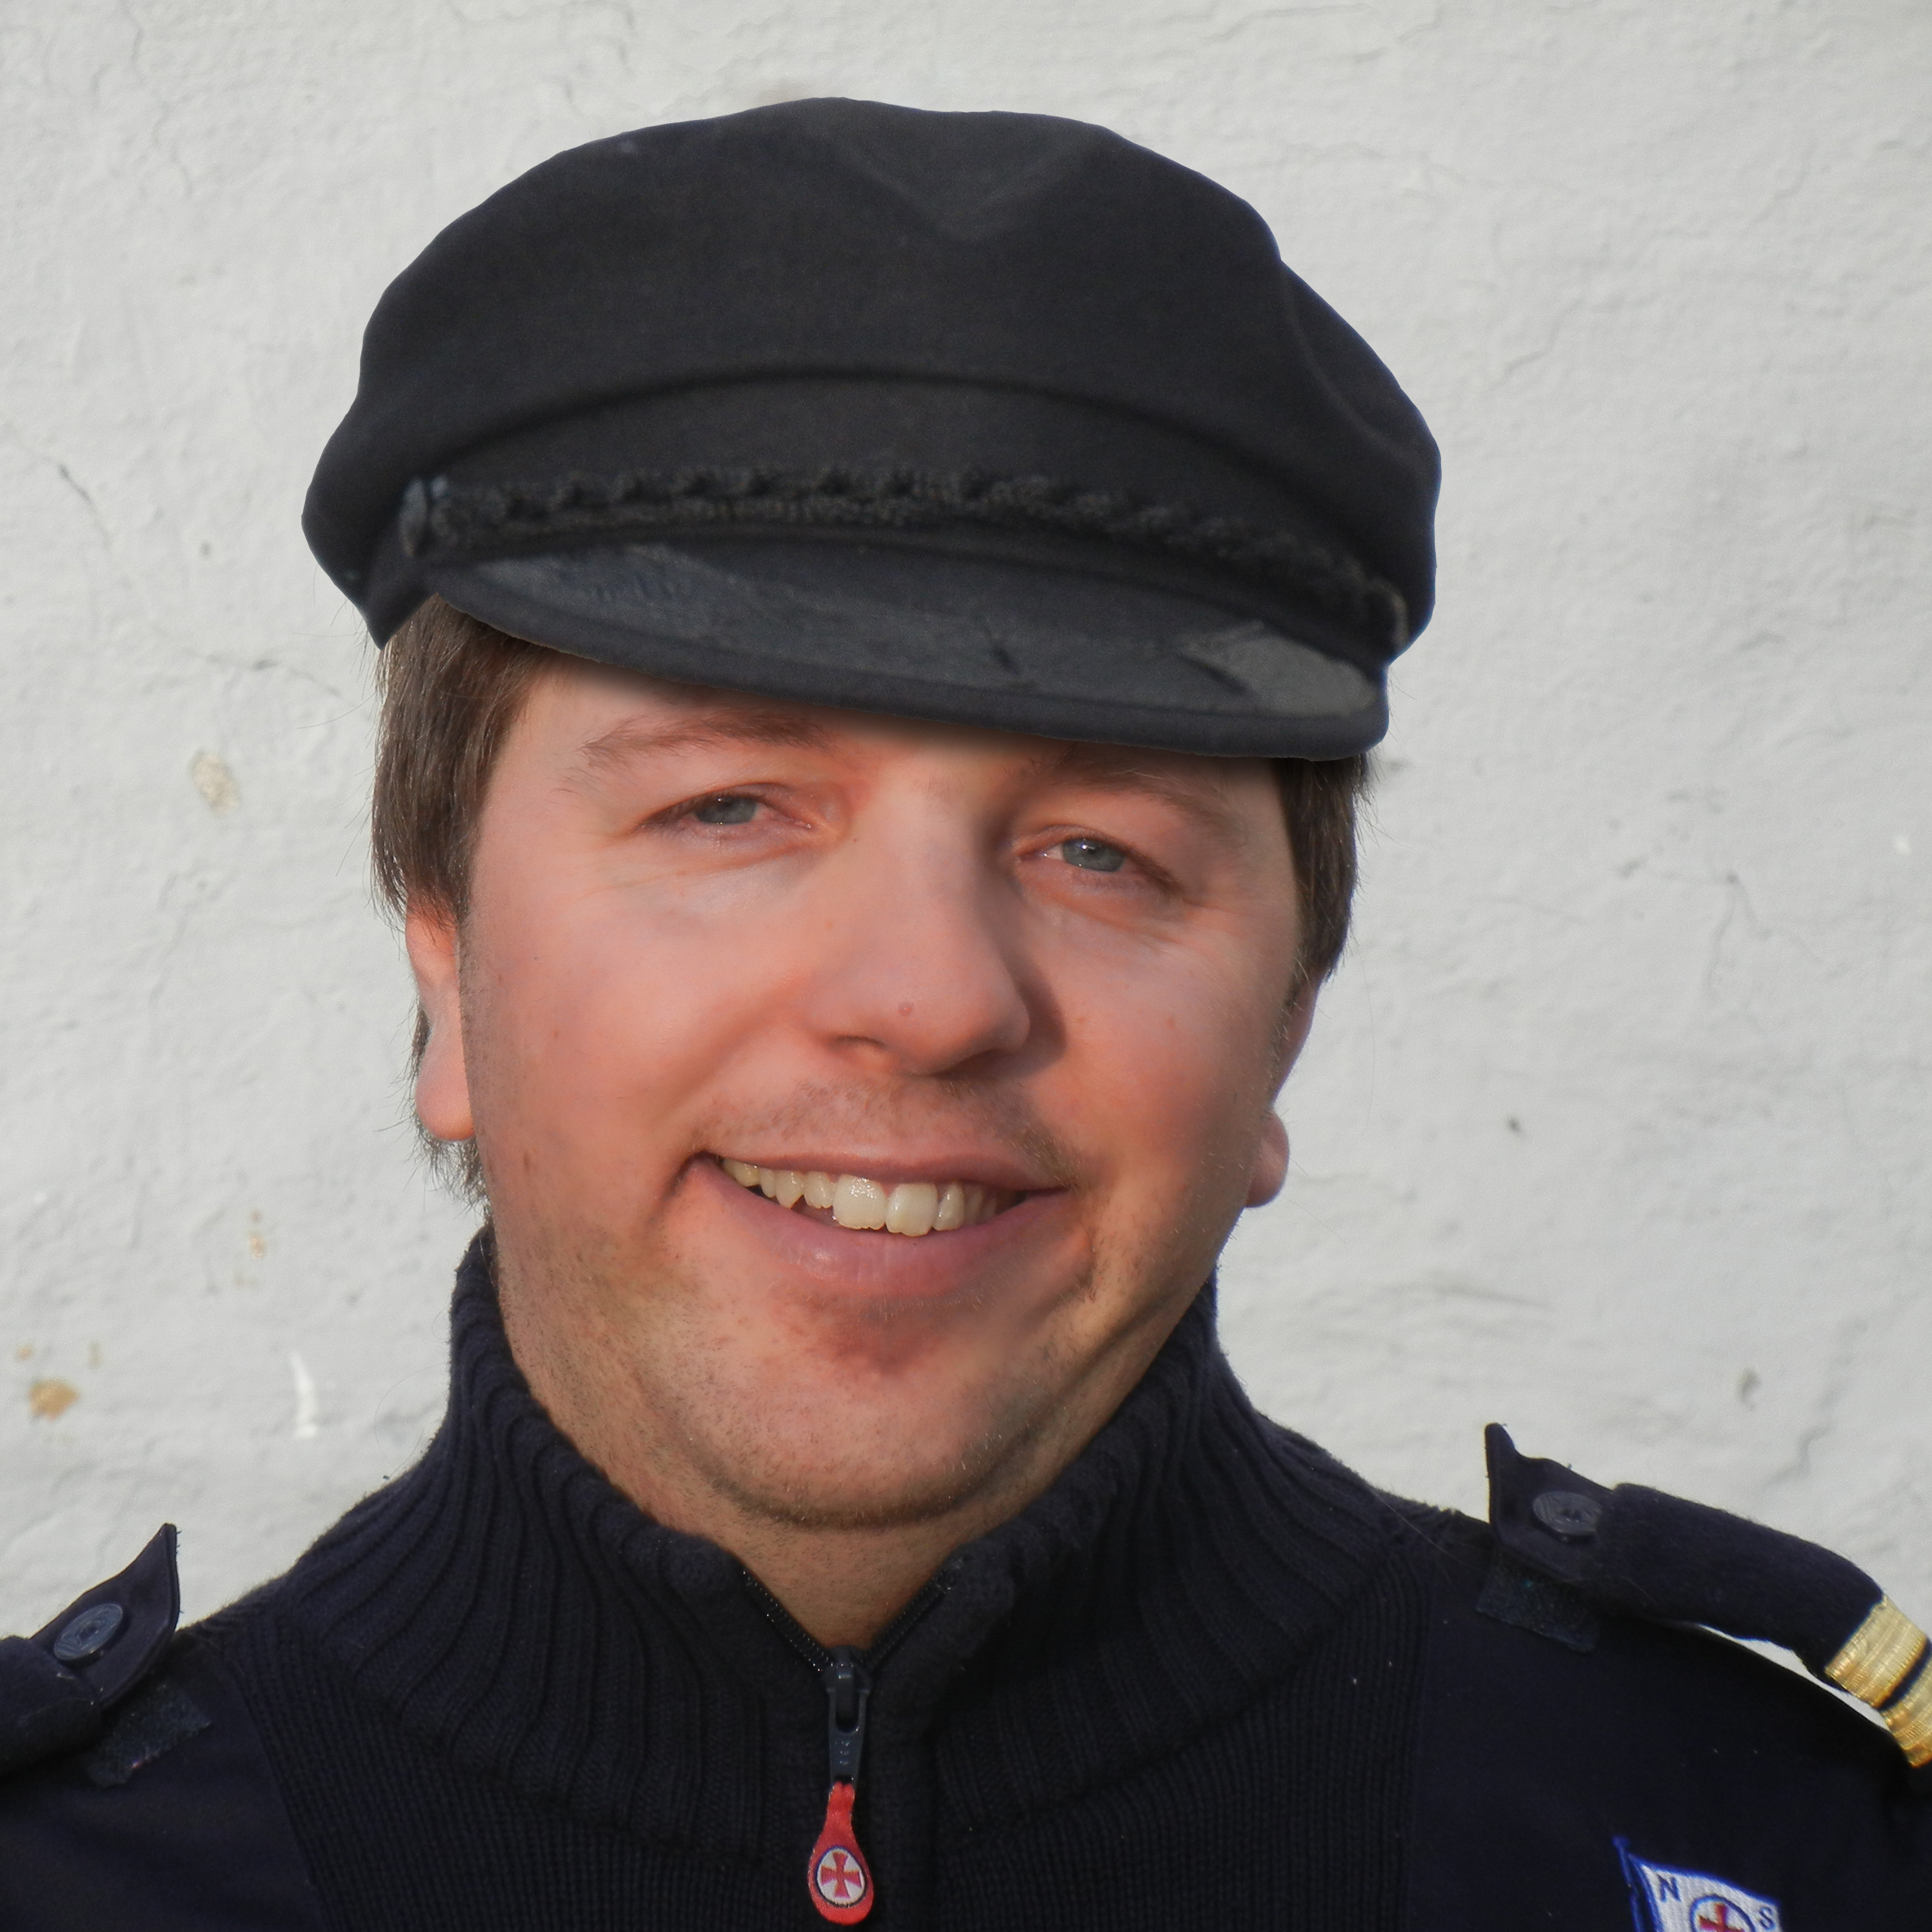 Mads Henrik Randøy